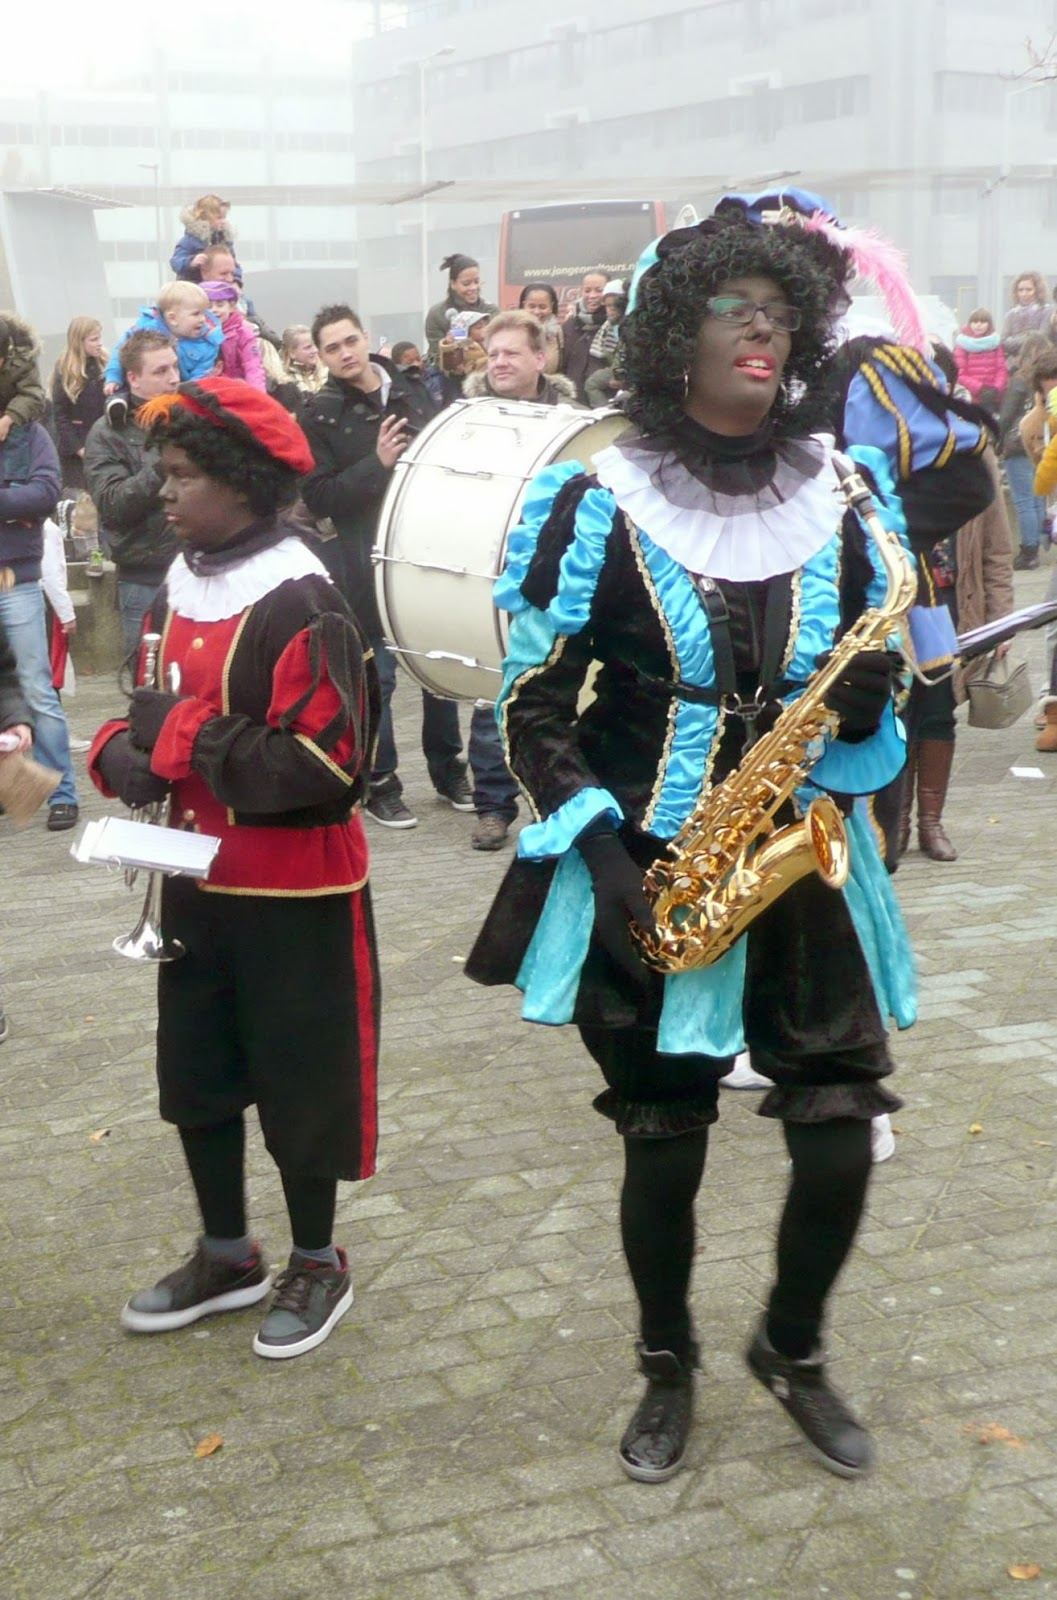 Pieten aiutanti di Sinterklaas